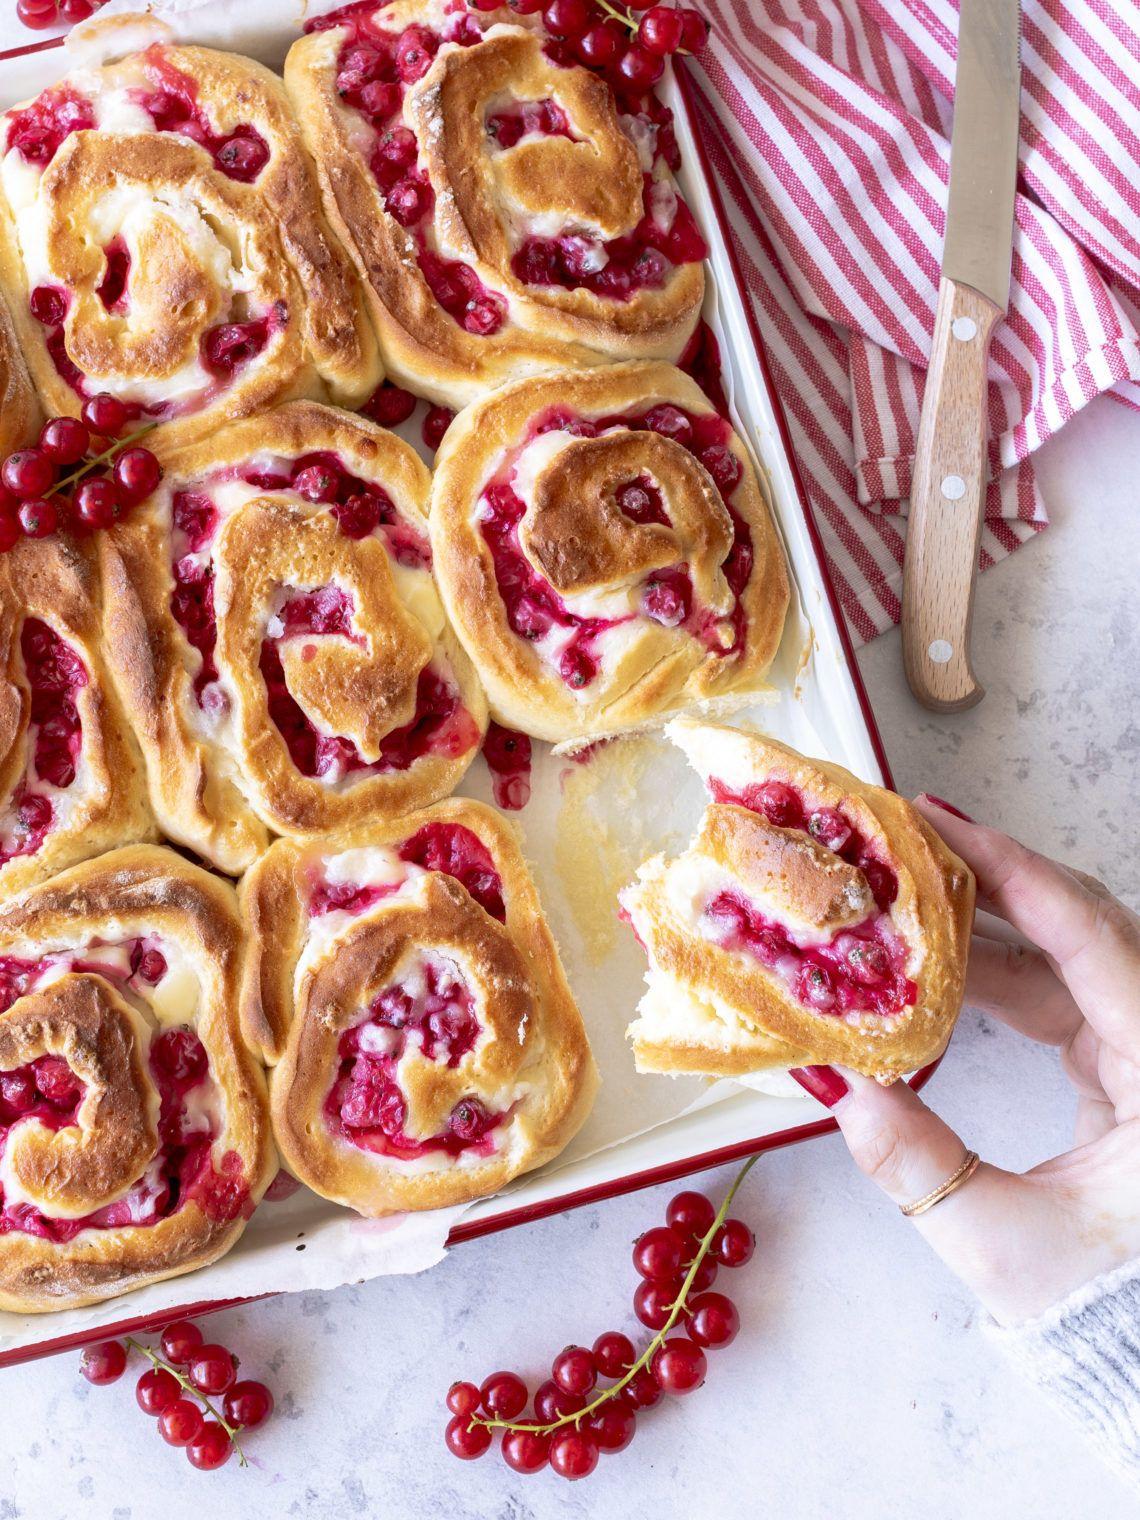 Emma's Lieblingsstücke | cake / food / DIY and more #fooddiy